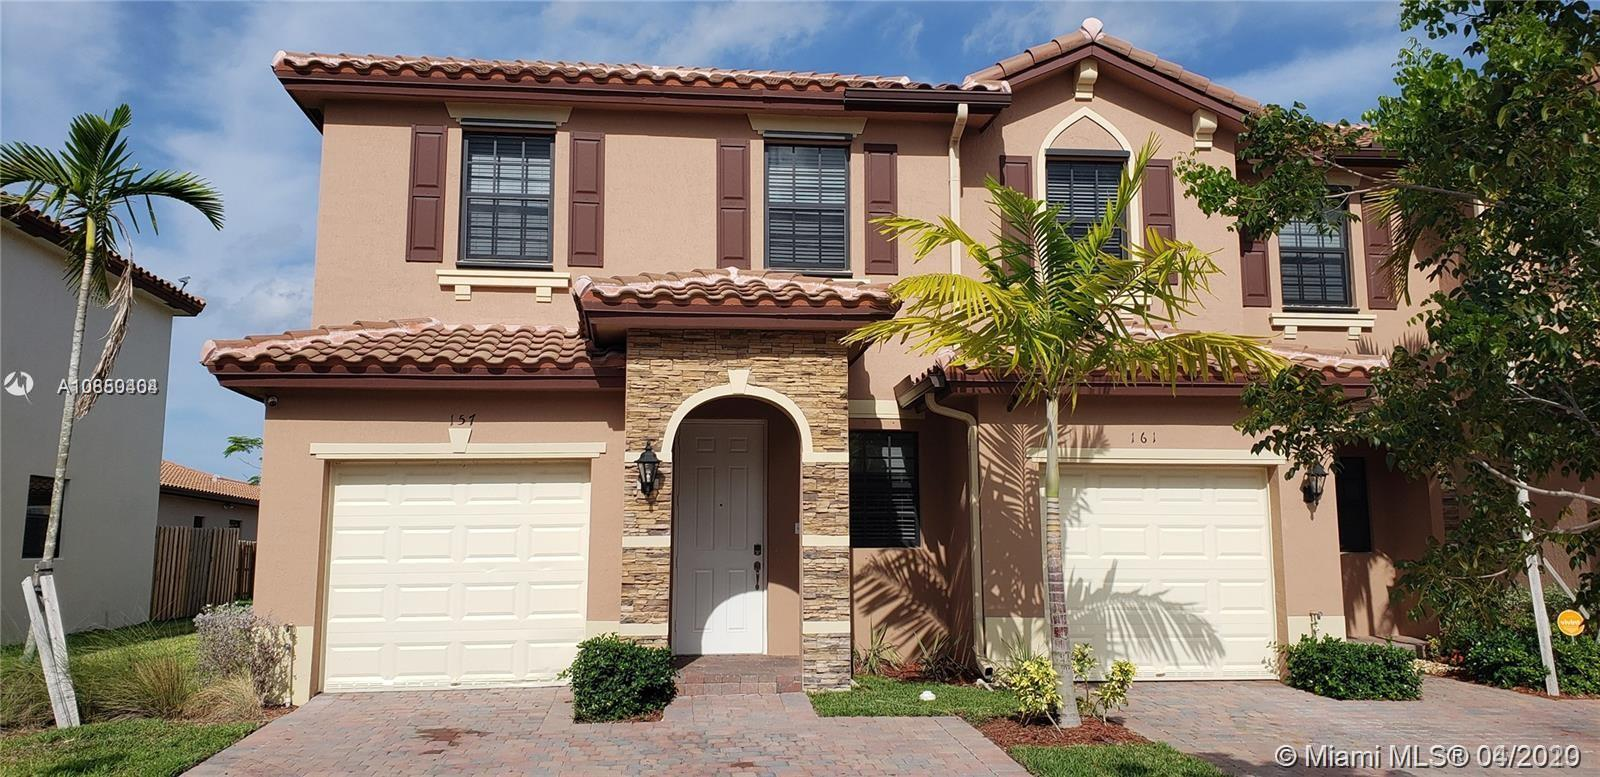 157 SE 34th Ter, Homestead, FL 33033 - Homestead, FL real estate listing